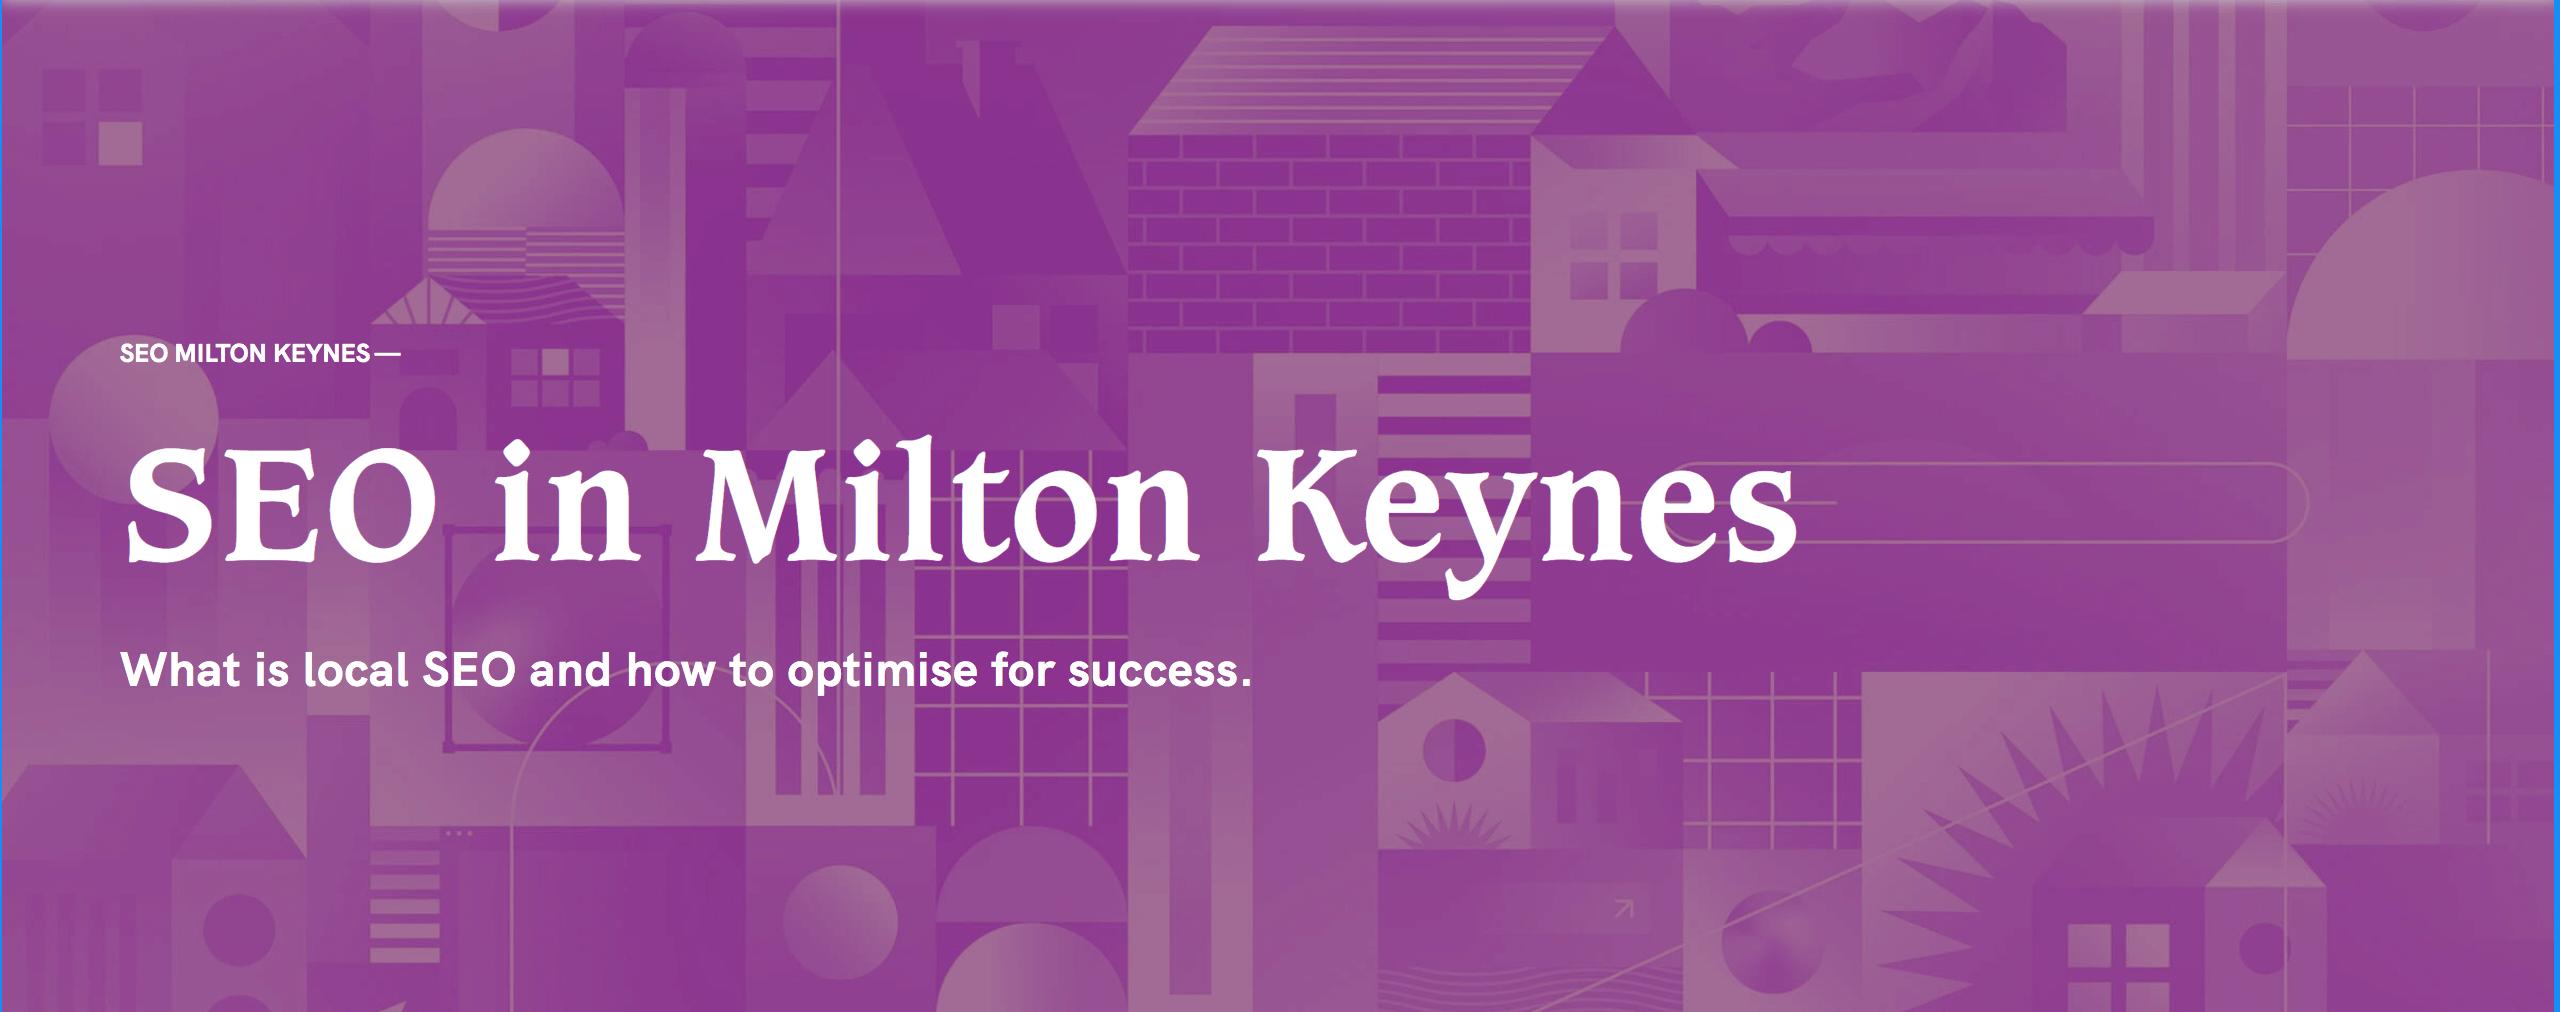 seo in milton keynes cover image